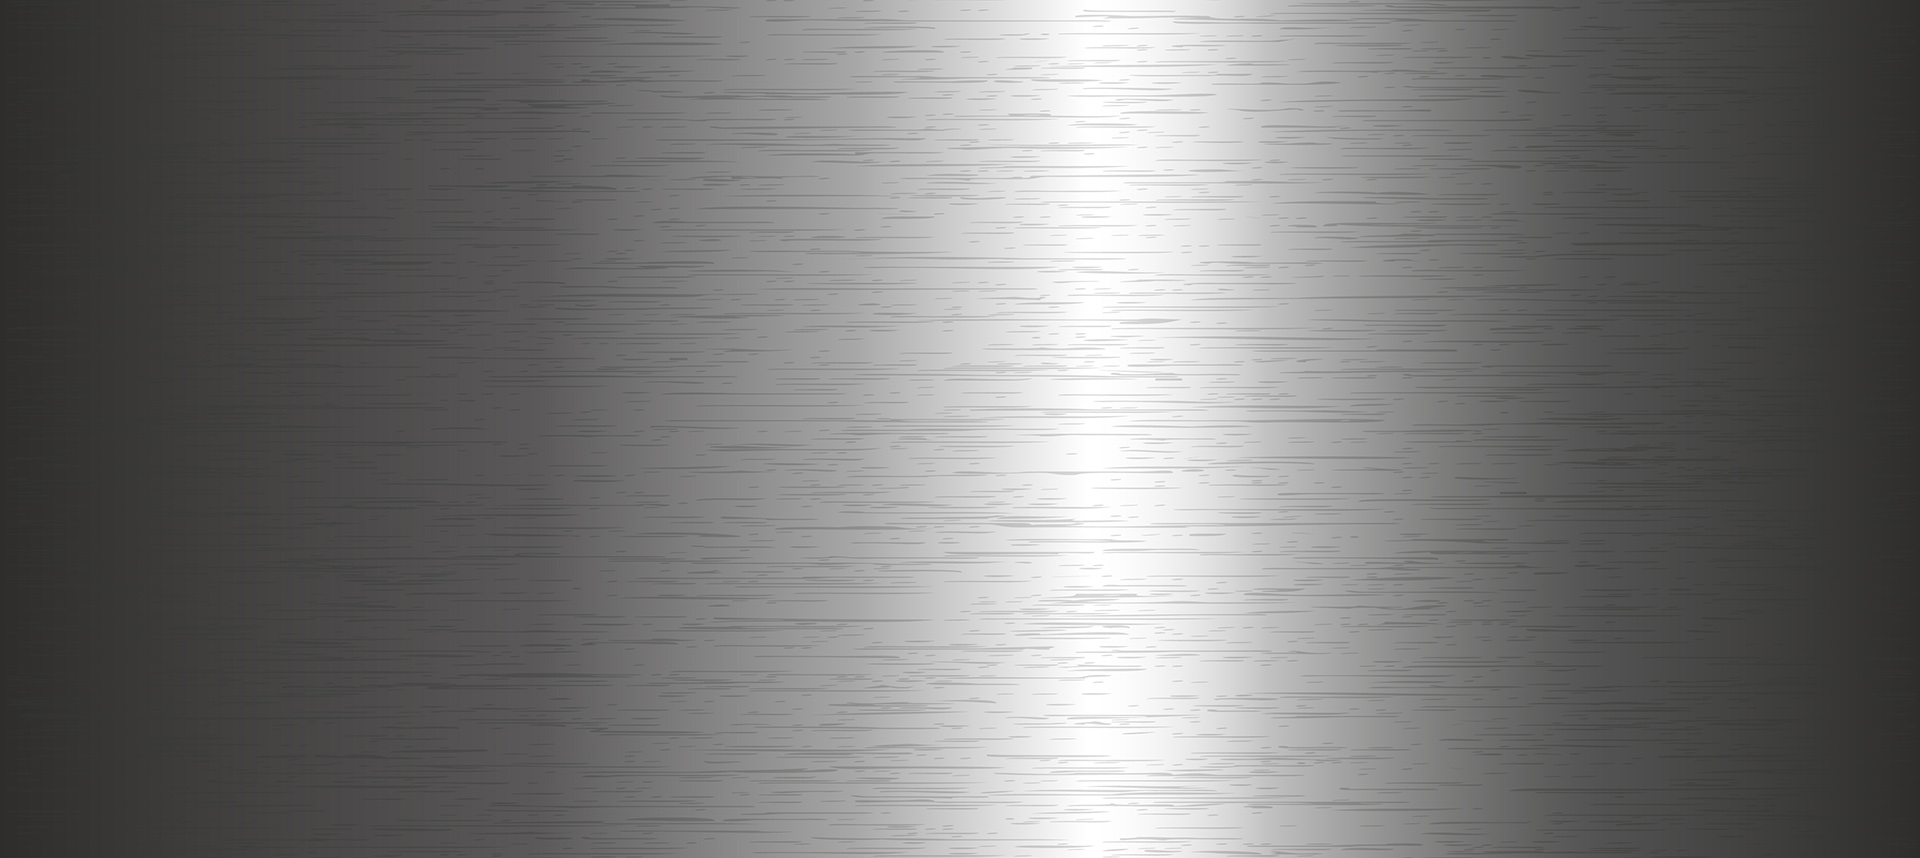 grupo textura material patr u00f3n antecedentes superficie fondos de pantalla tel u00f3n de fondo imagen